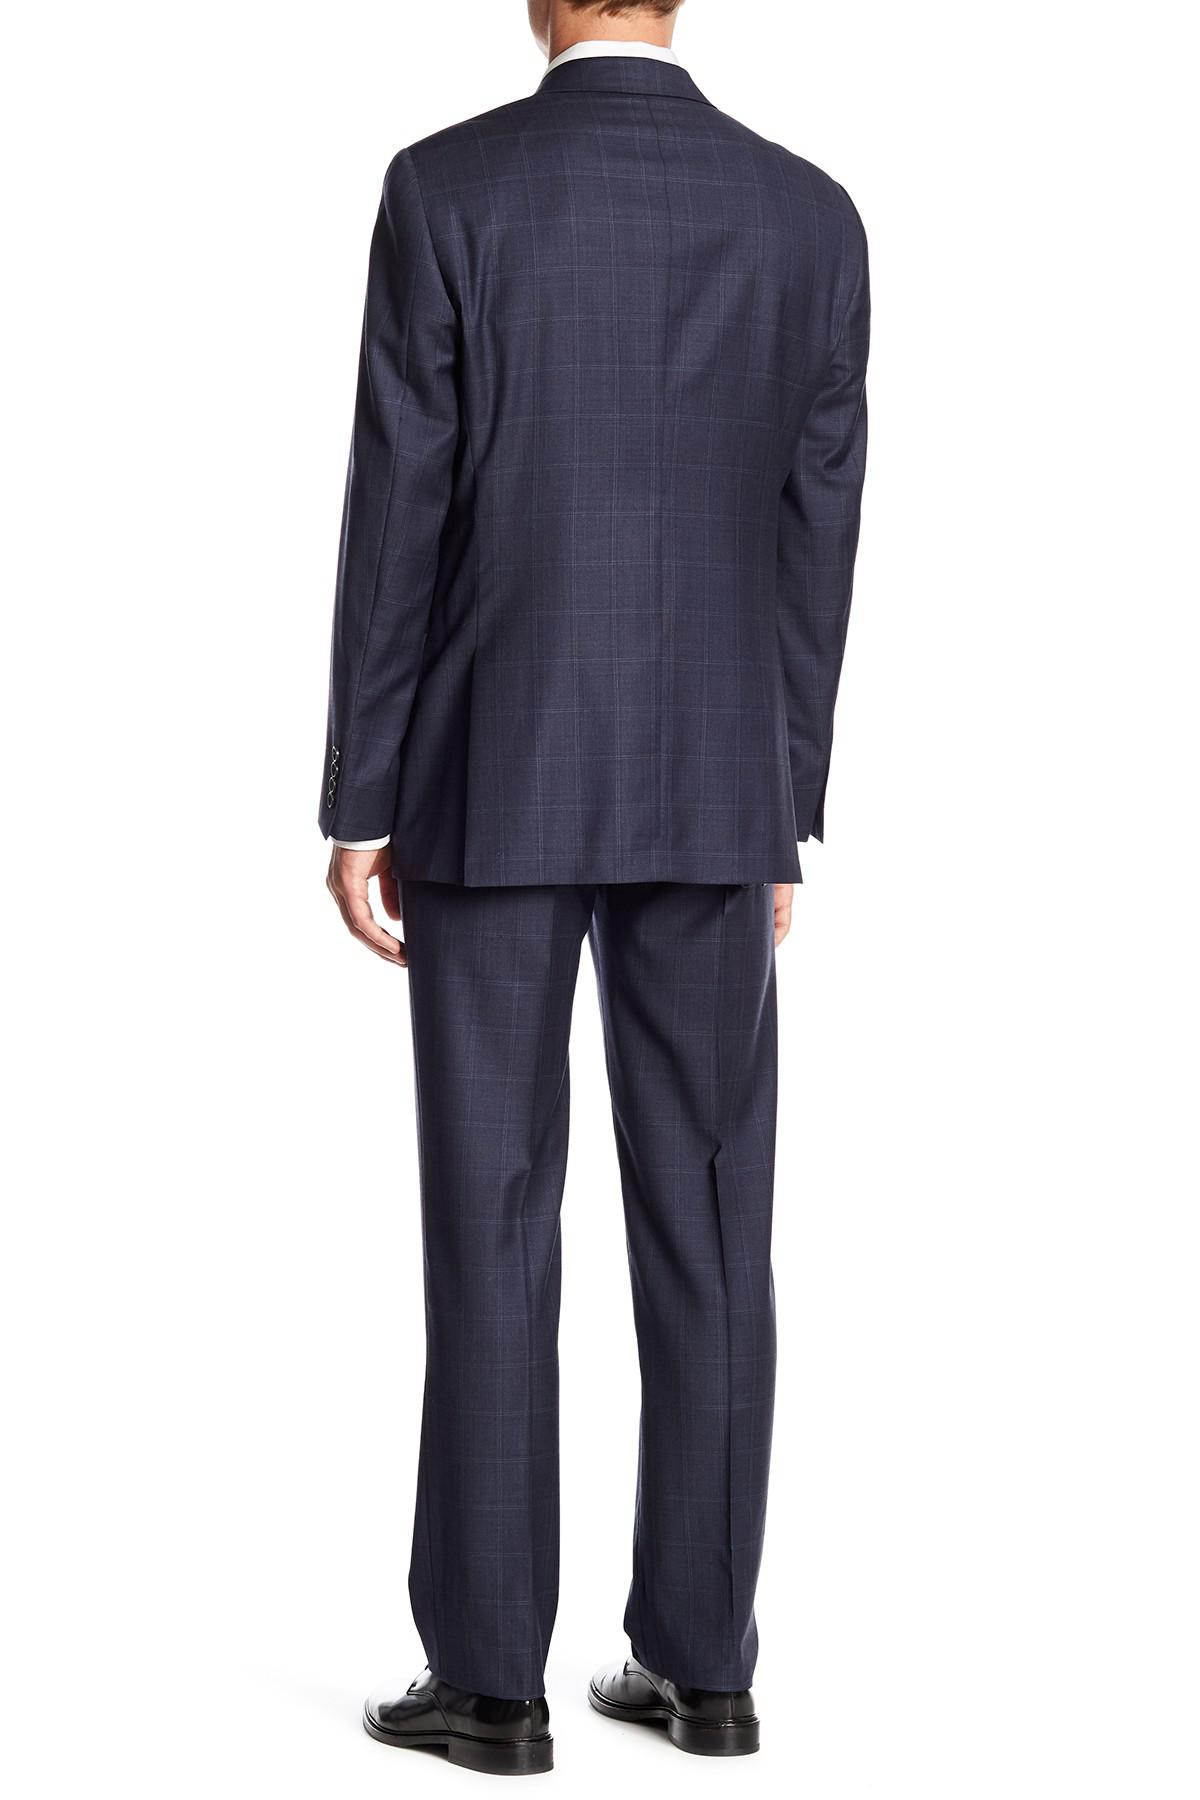 Navy Windowpane Notch Lapel Wool New York Fit Suit